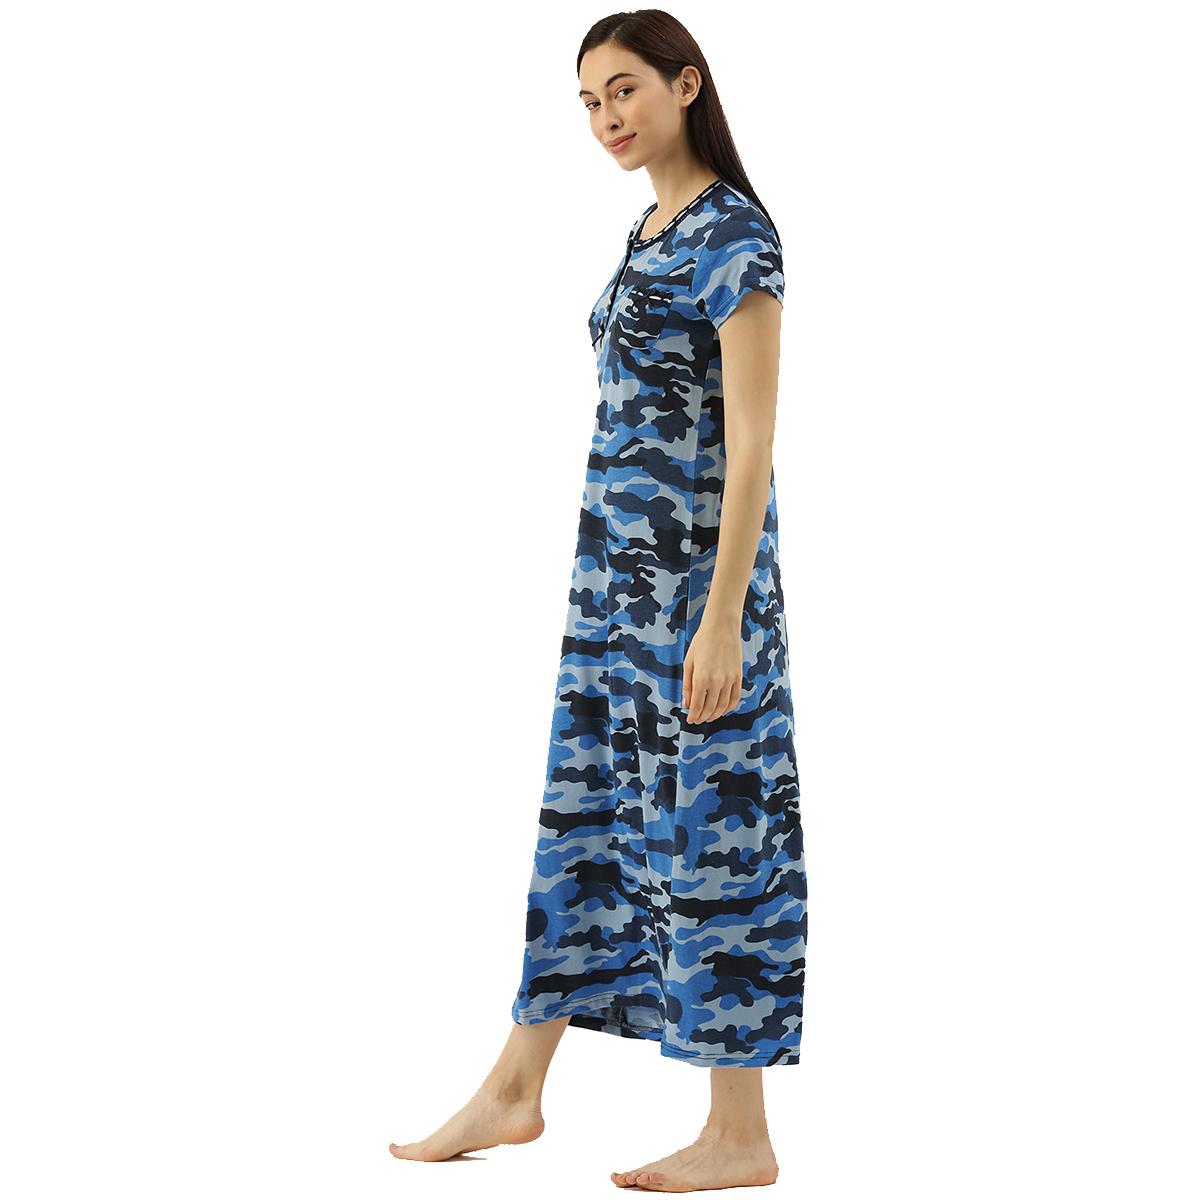 Slumber Jill Blue Camouflage Night Dress